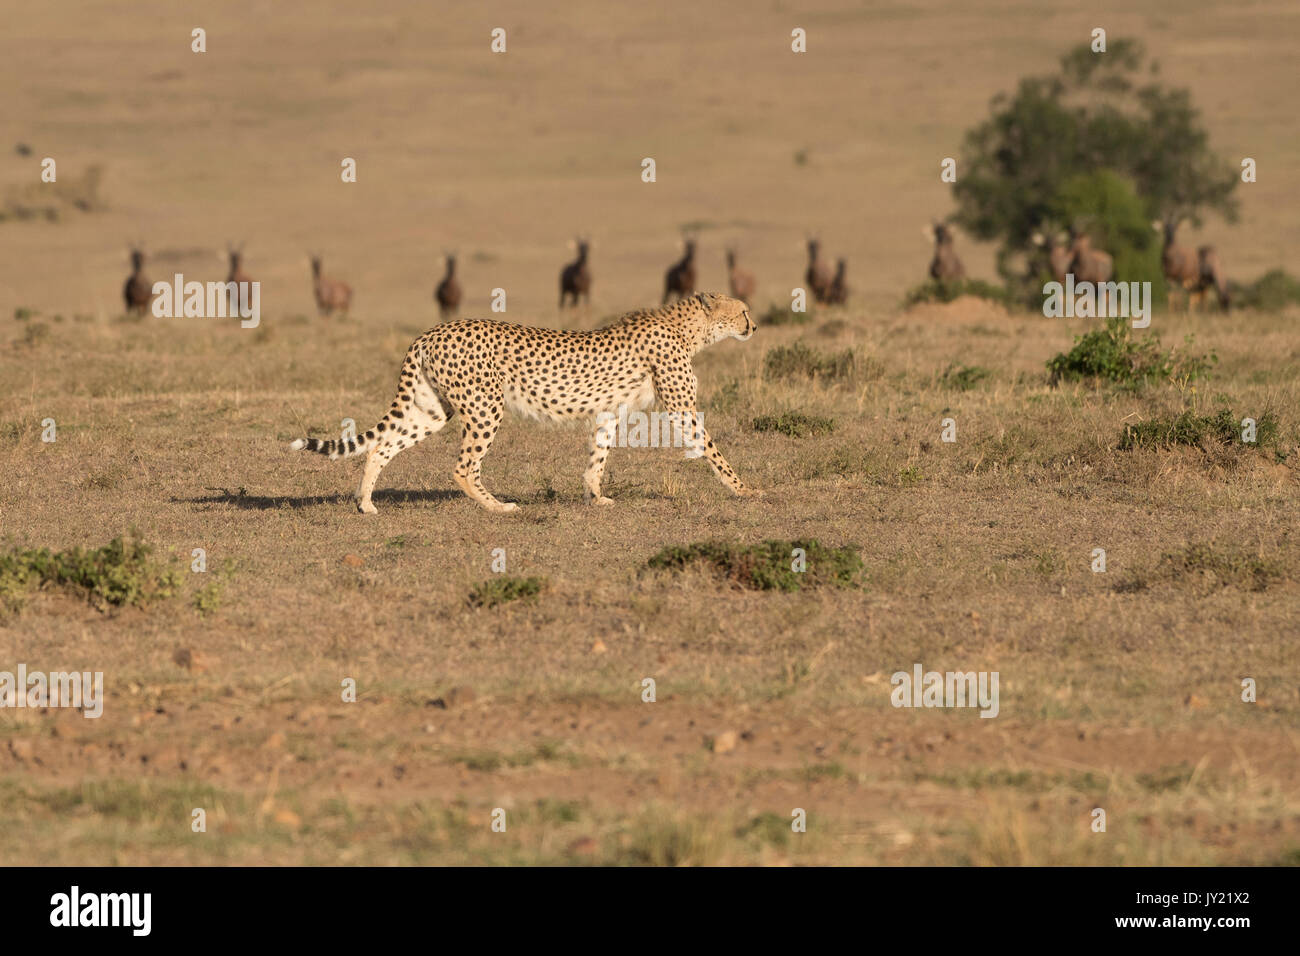 Female cheetah walking past topi antelope staring at her as she goes past in the Masai Mara game reserve in Kenya - Stock Image